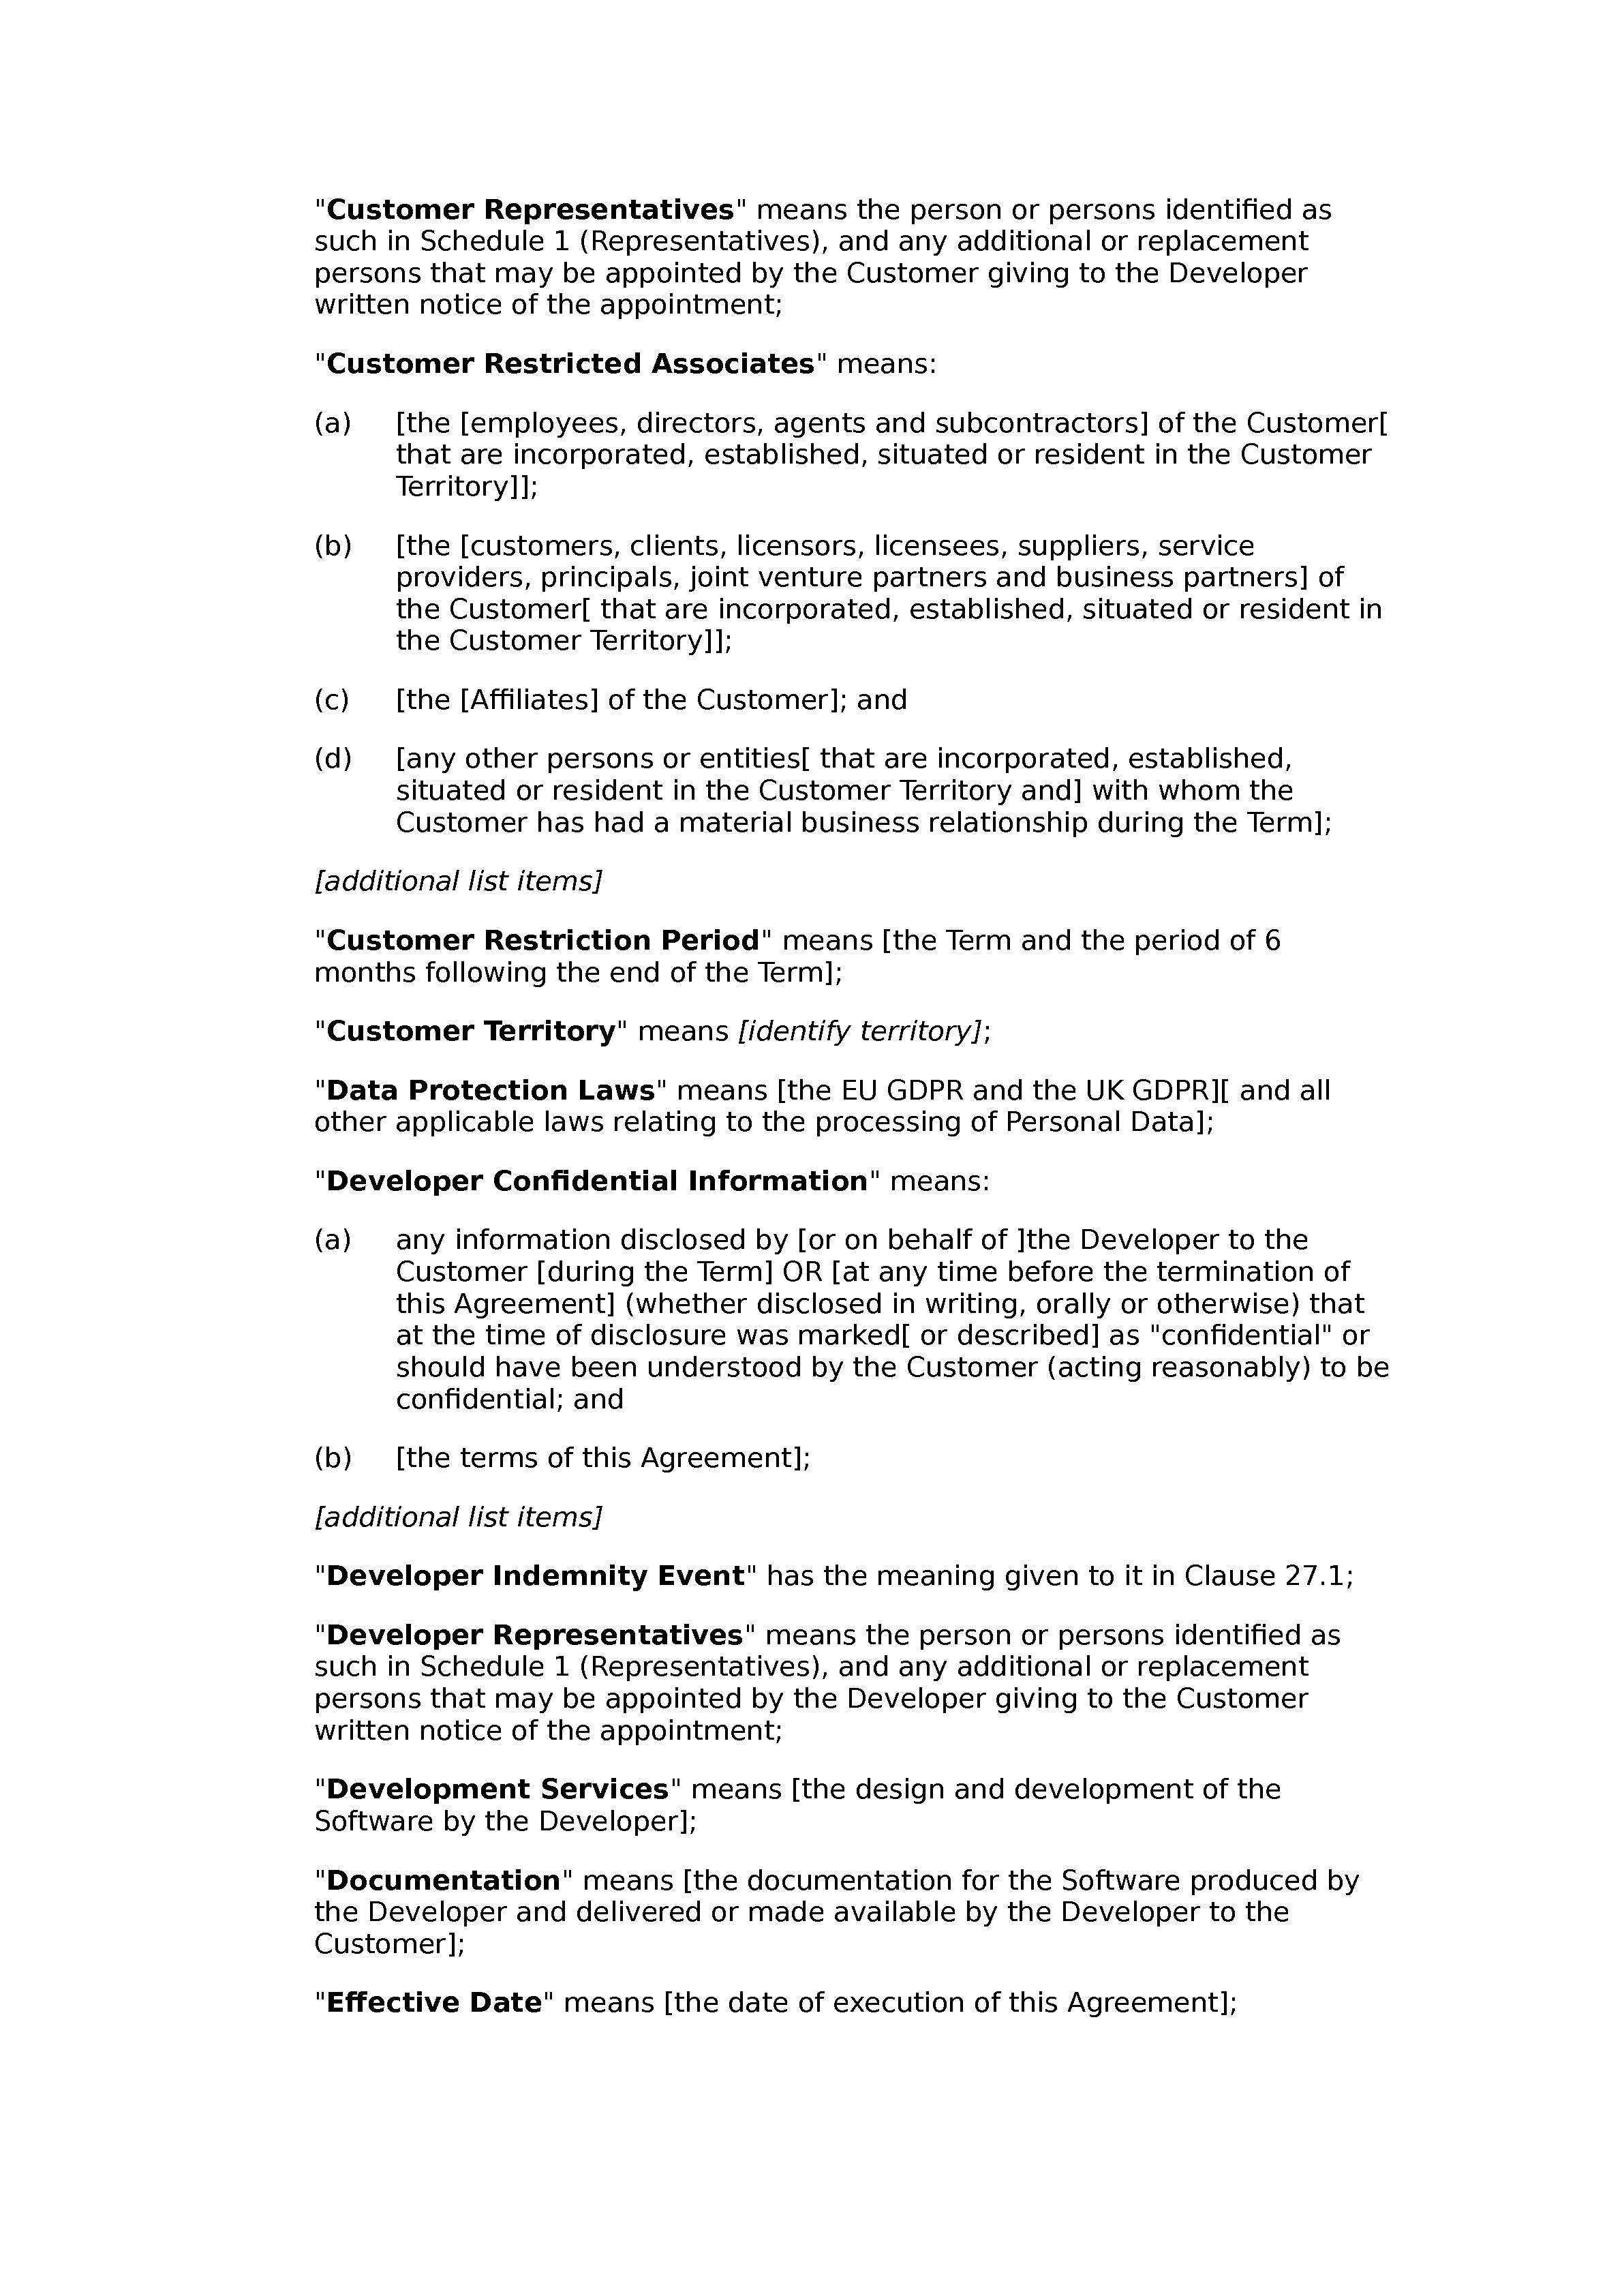 Framework software development agreement (premium) document preview